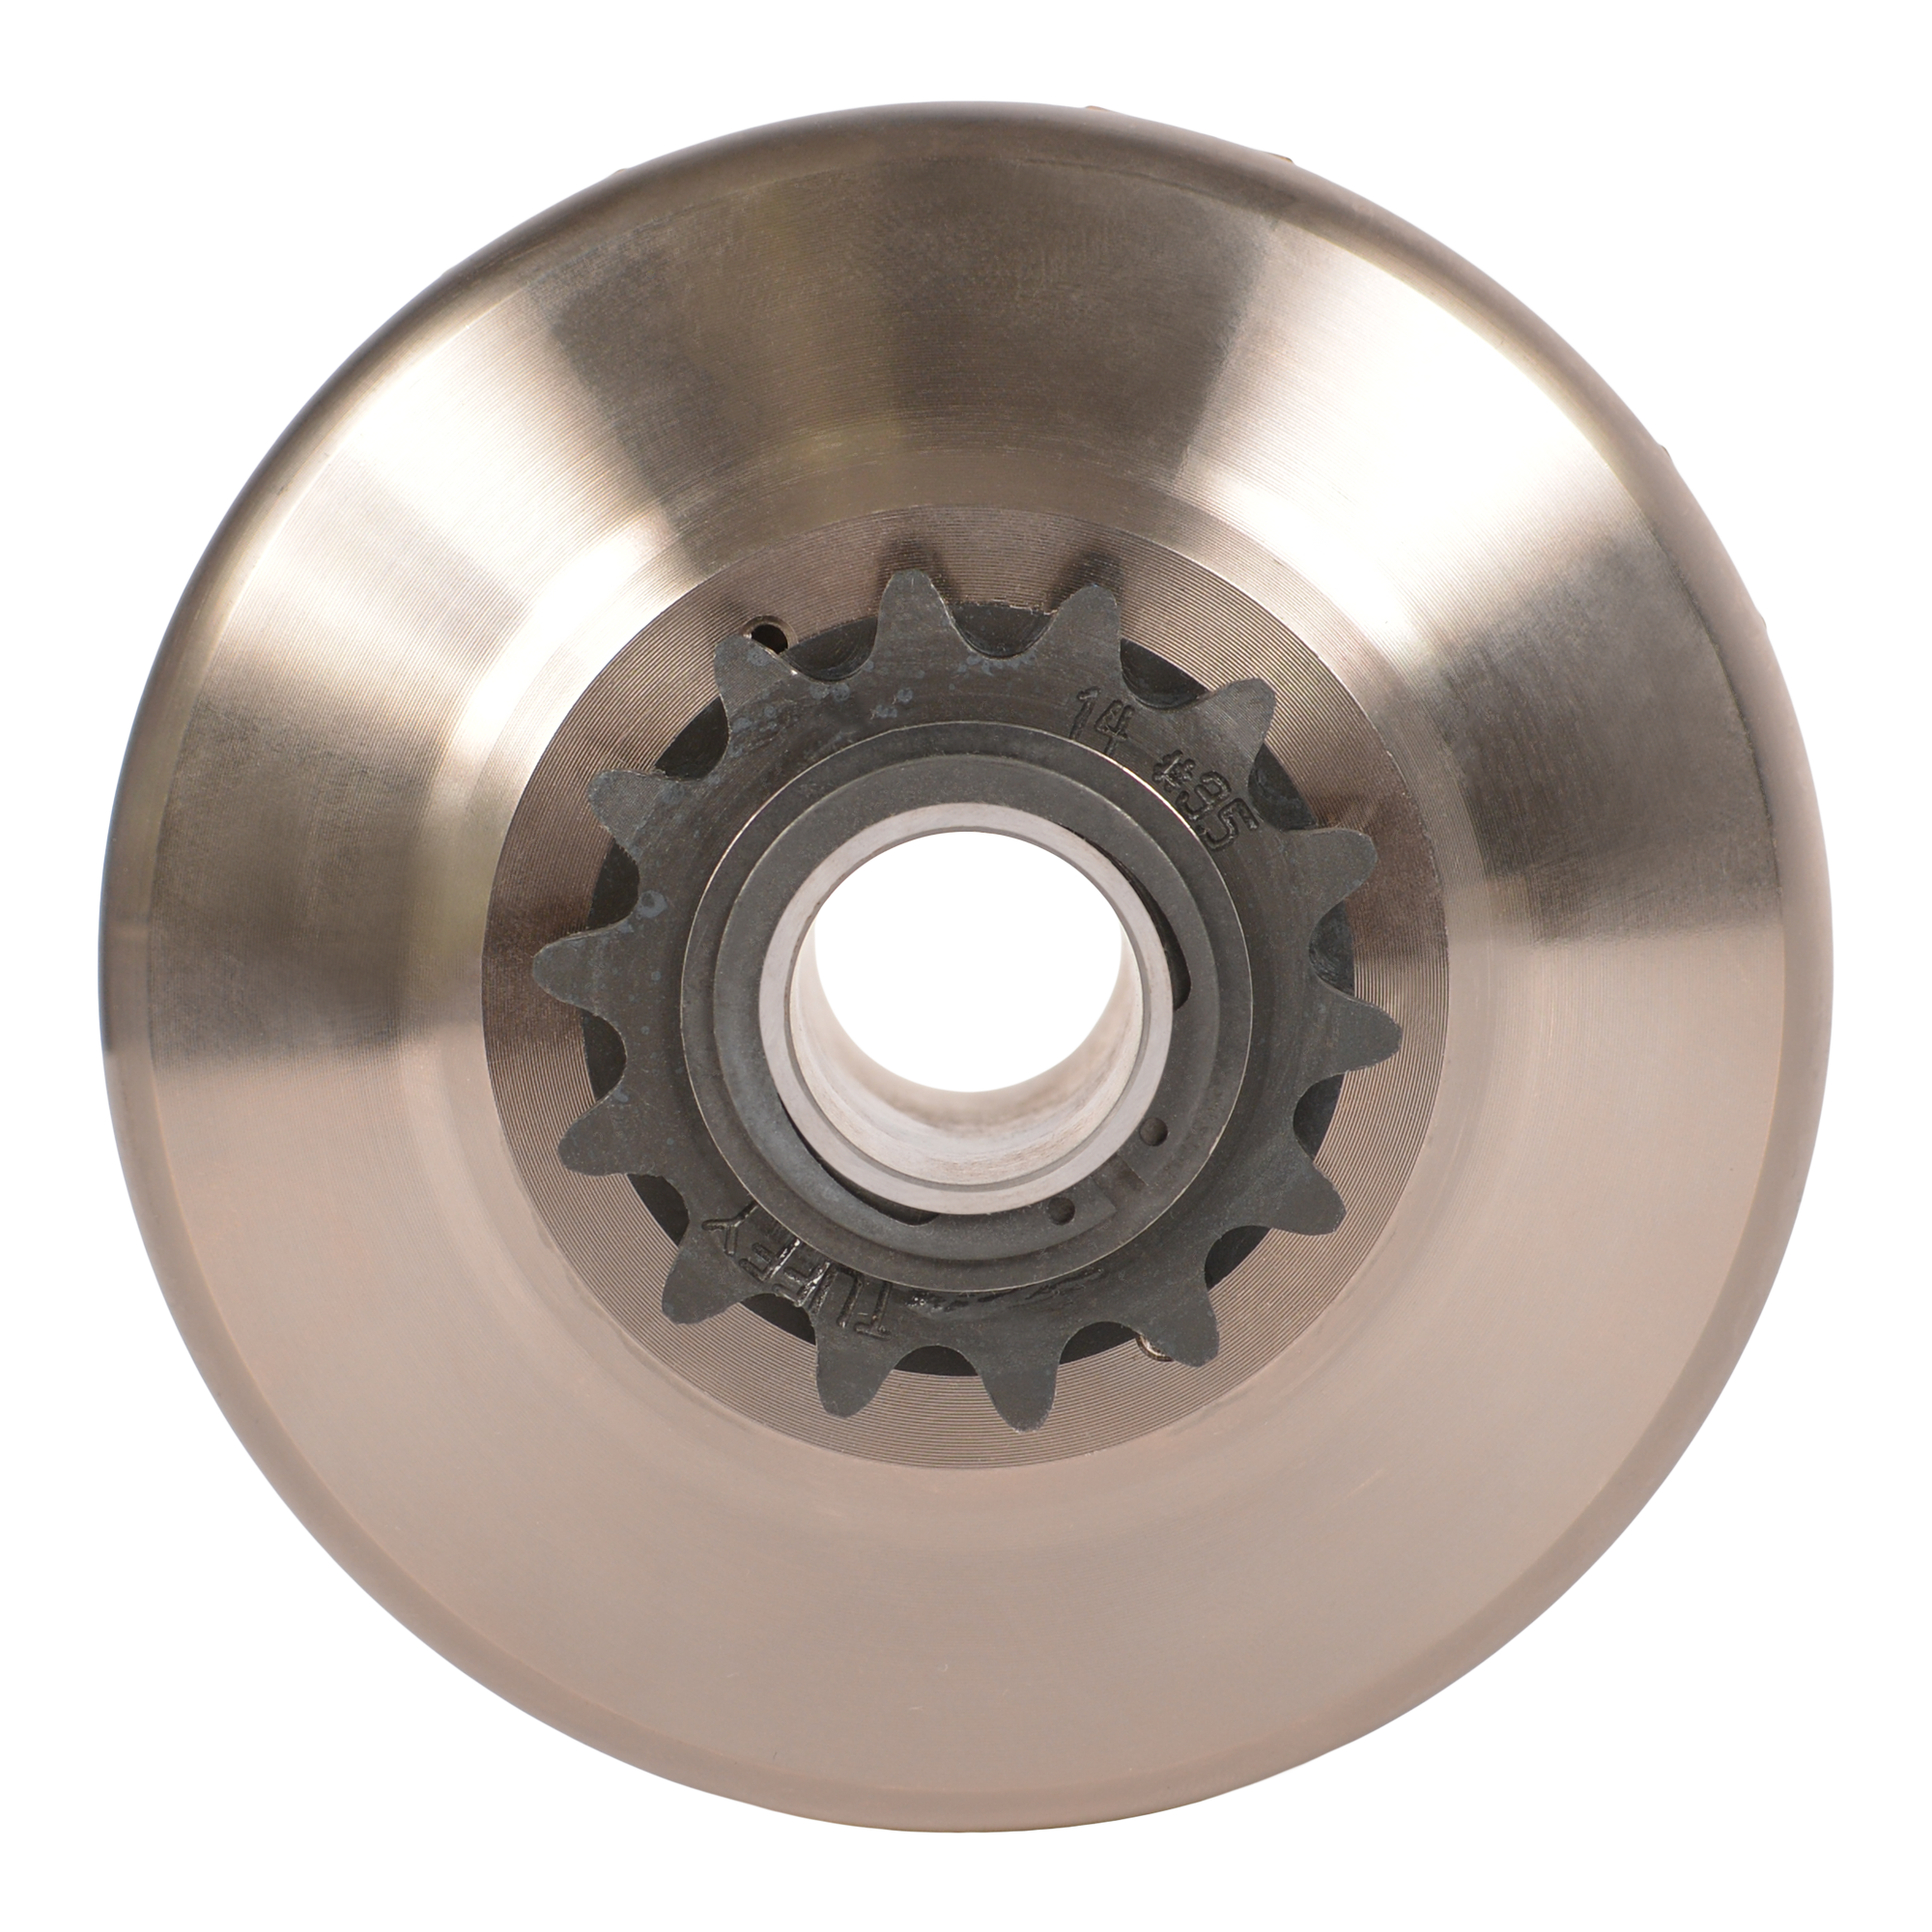 Bully Turbo Jackshaft Clutch - 4 Disc, 6 Spring